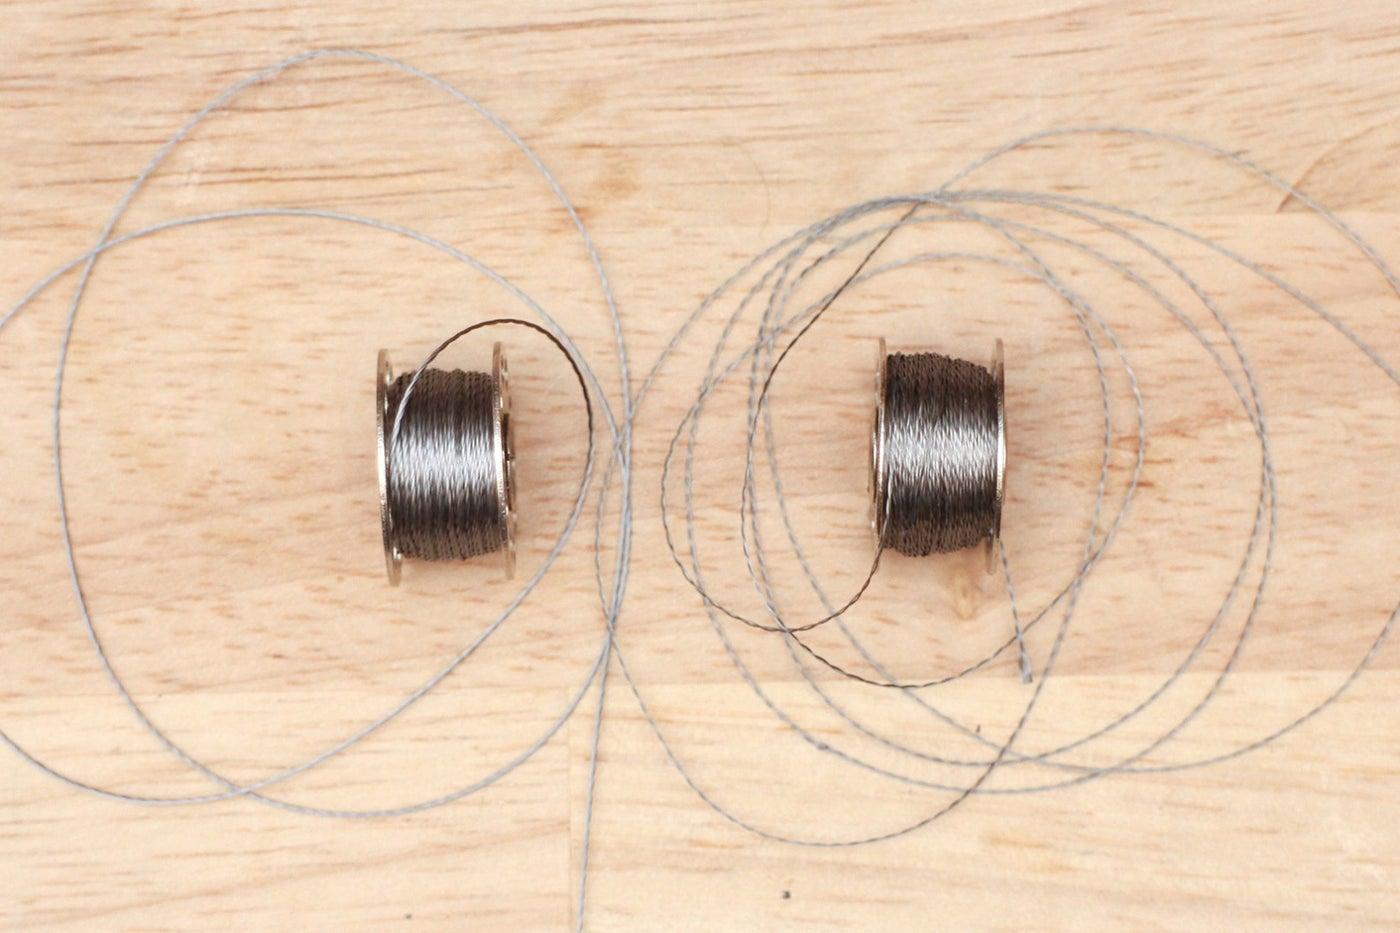 Introducing Conductive Thread